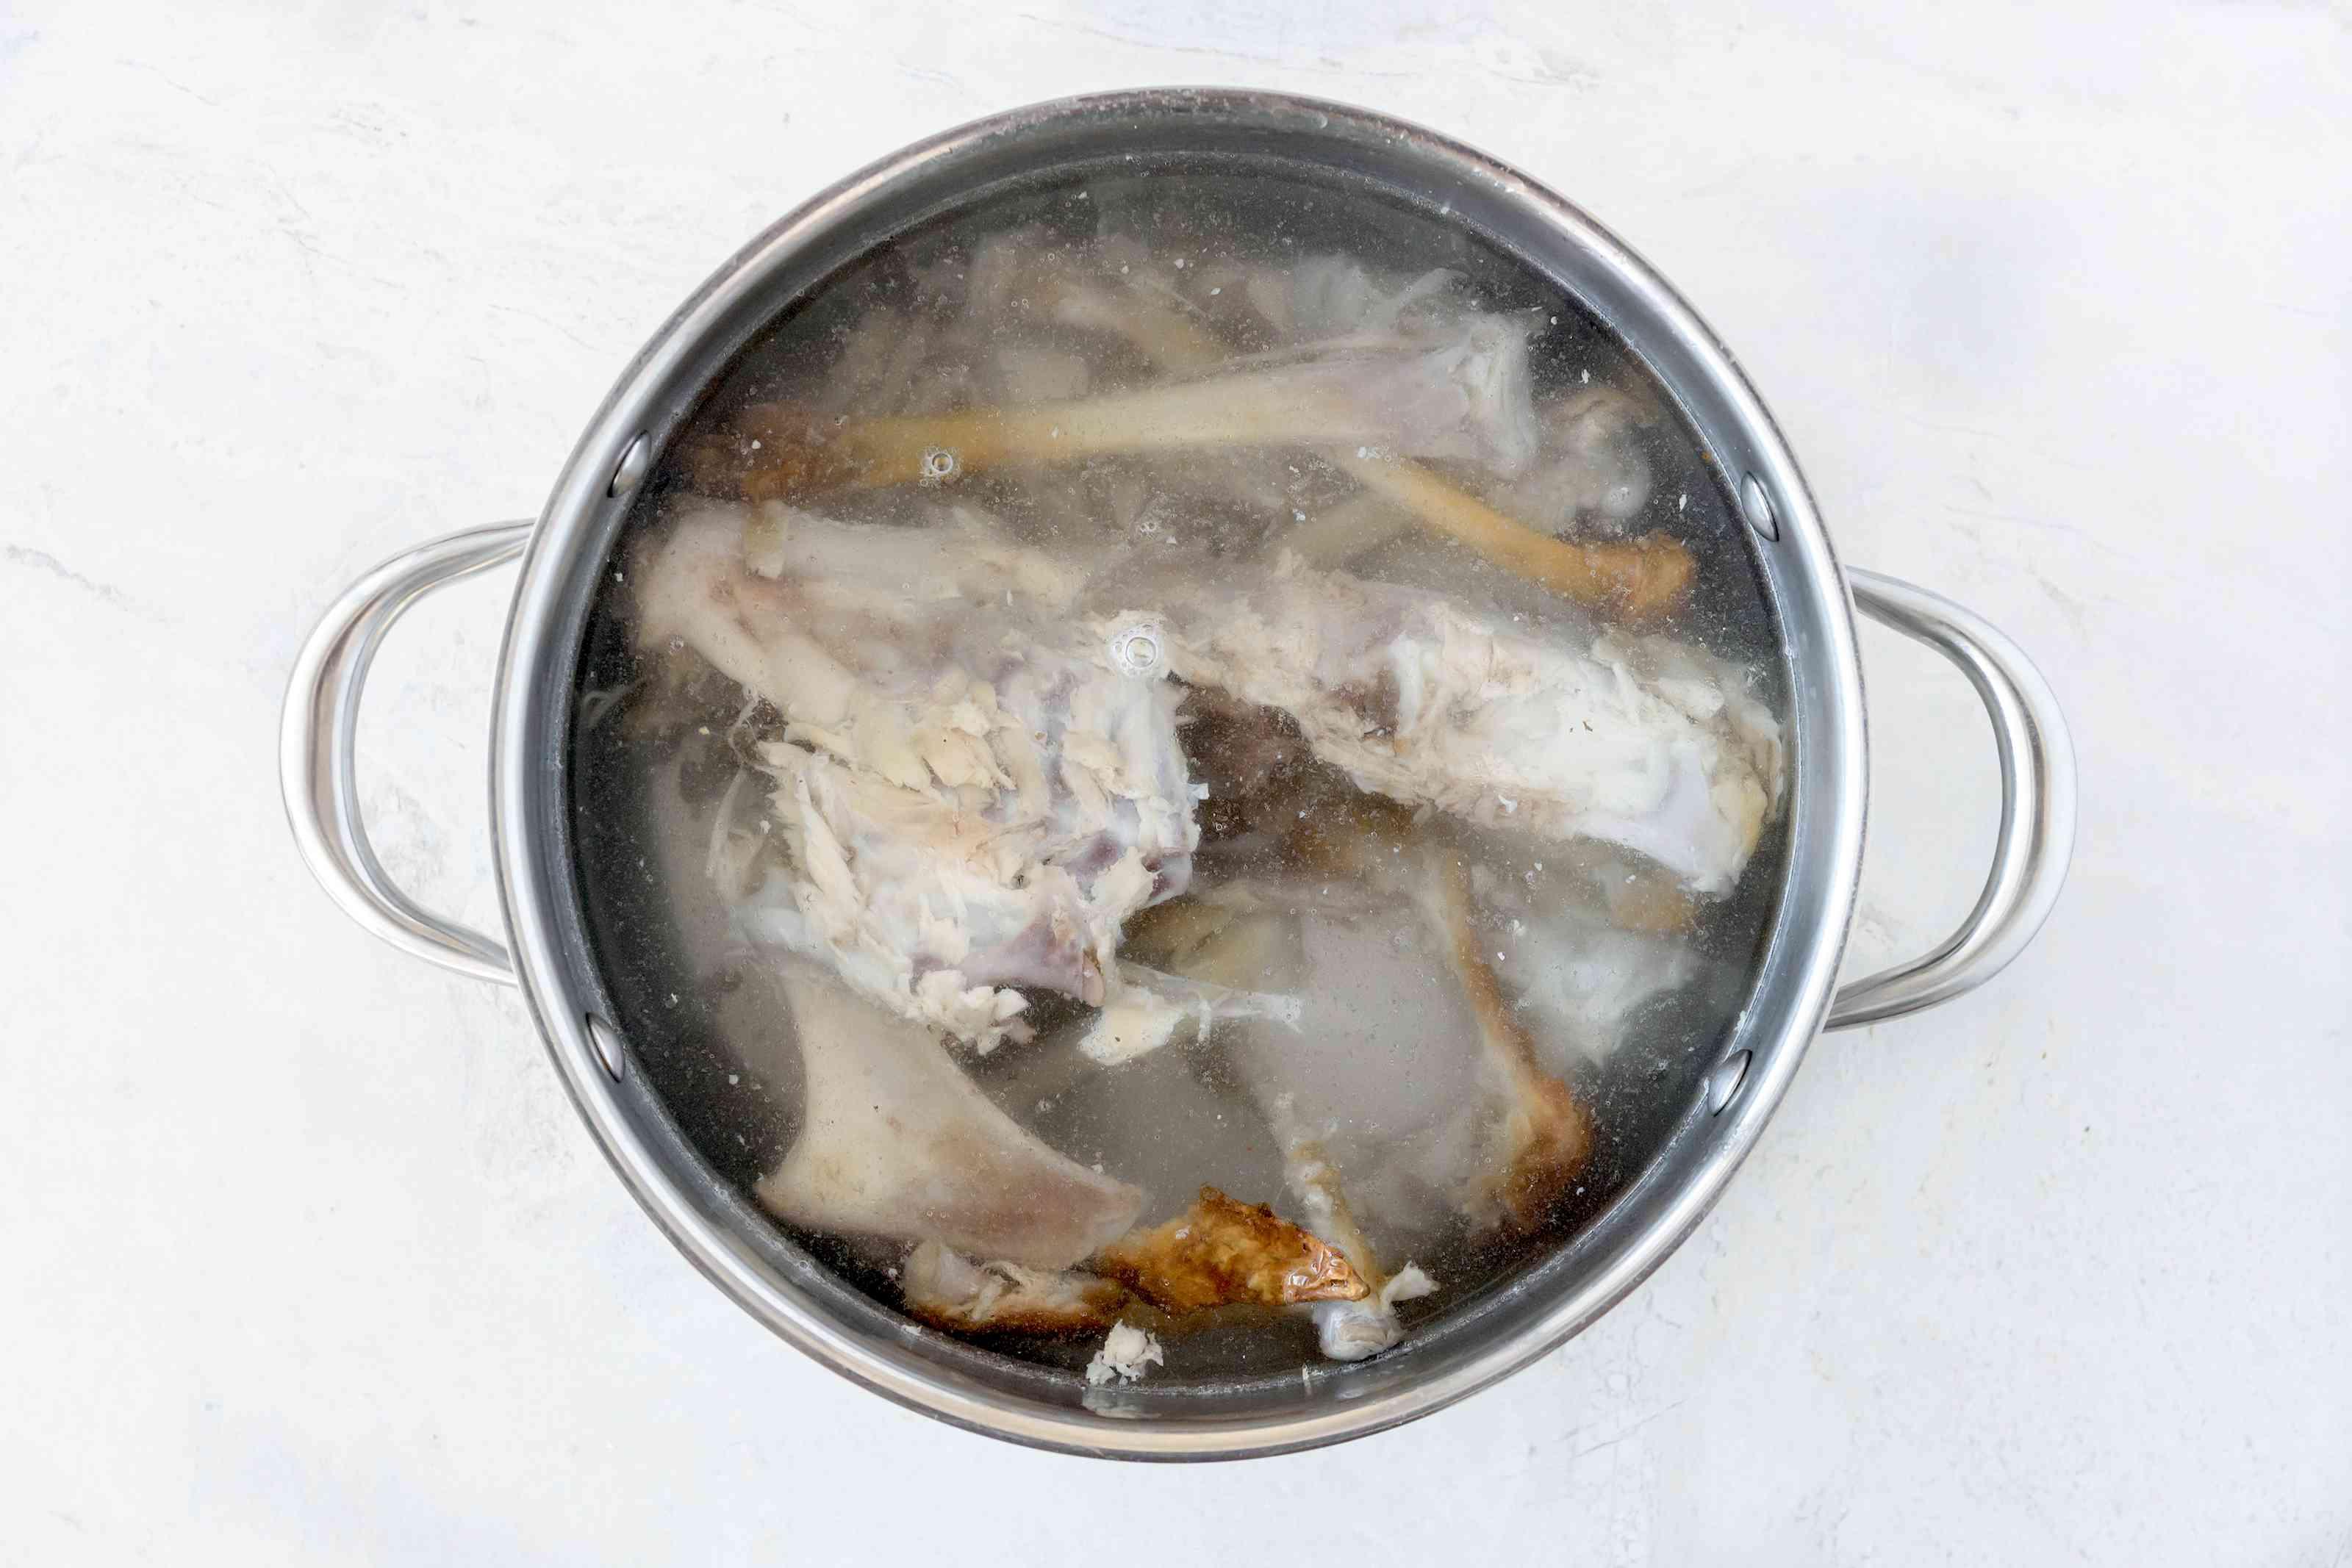 Return bones to pot